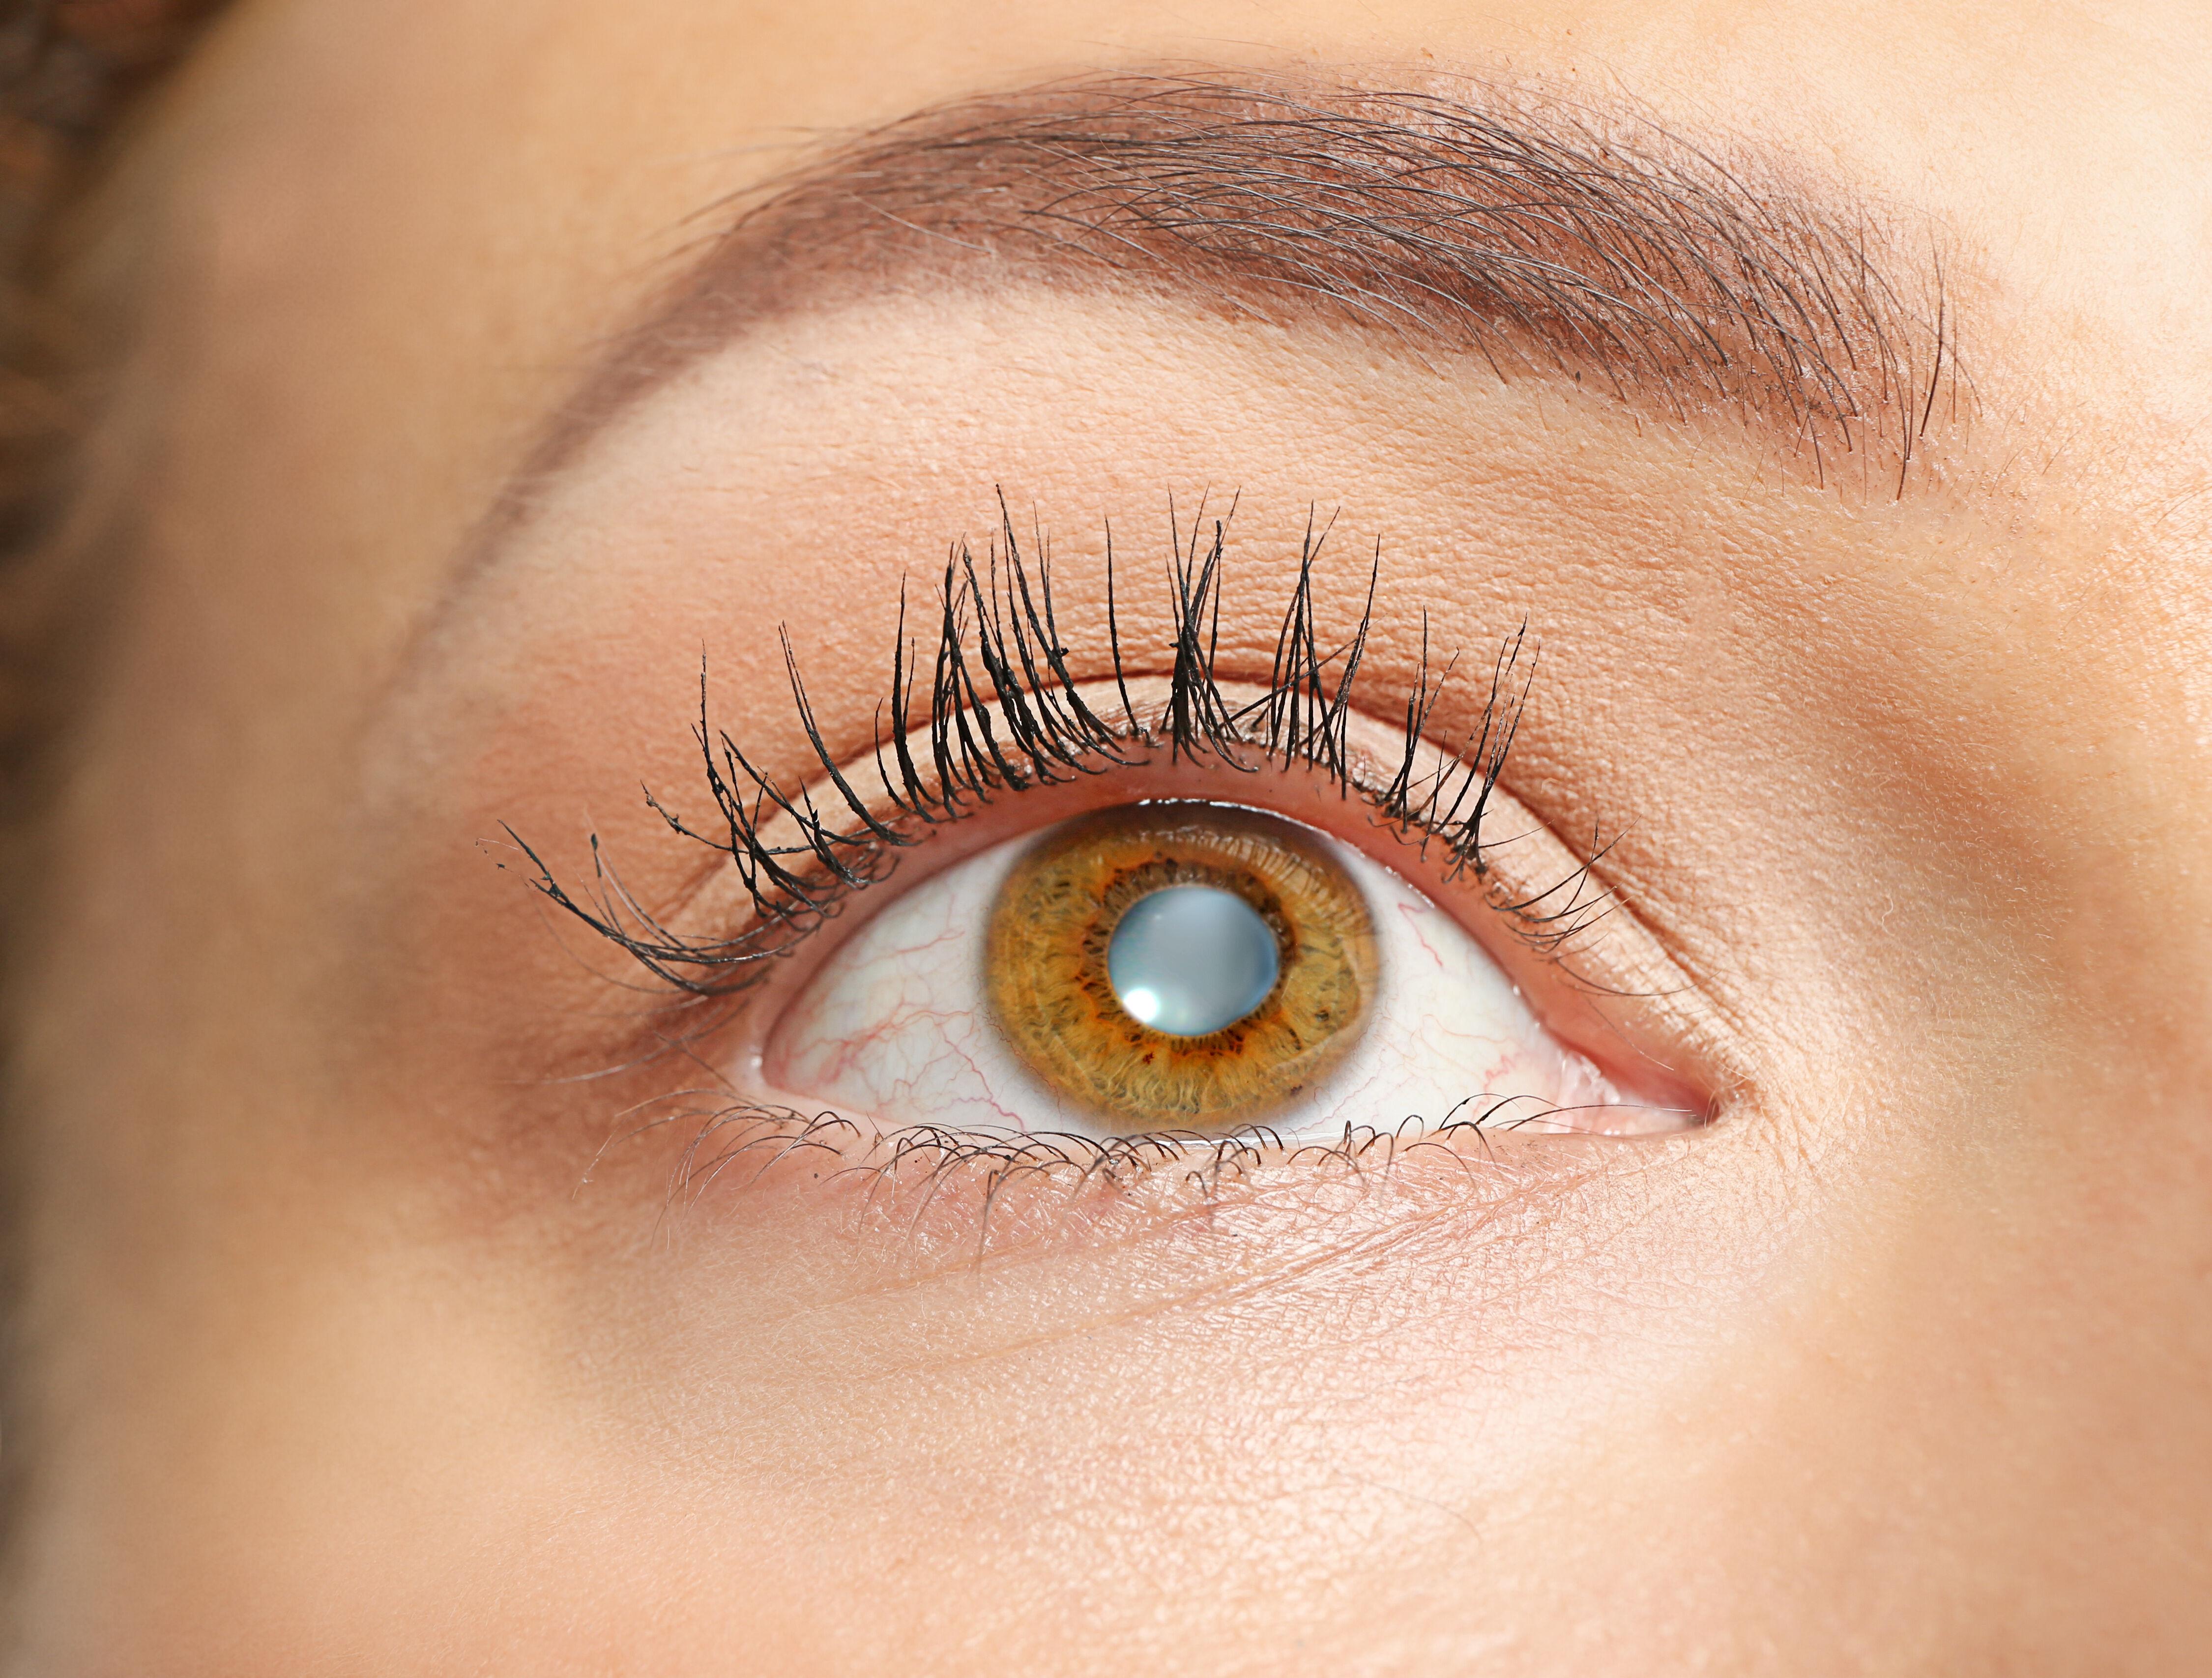 A cataract symptoms